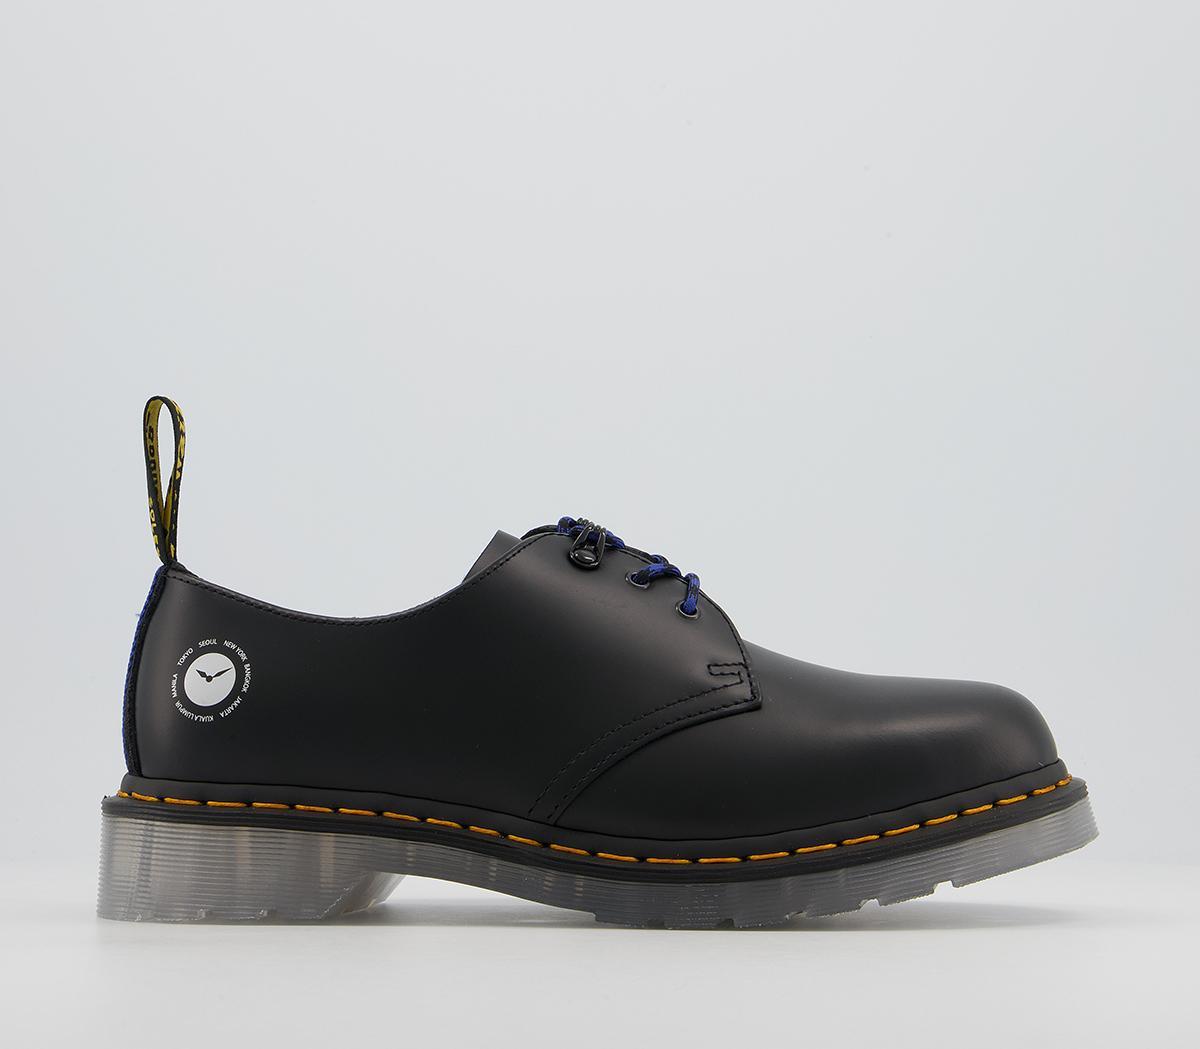 1461 Atmos Shoes